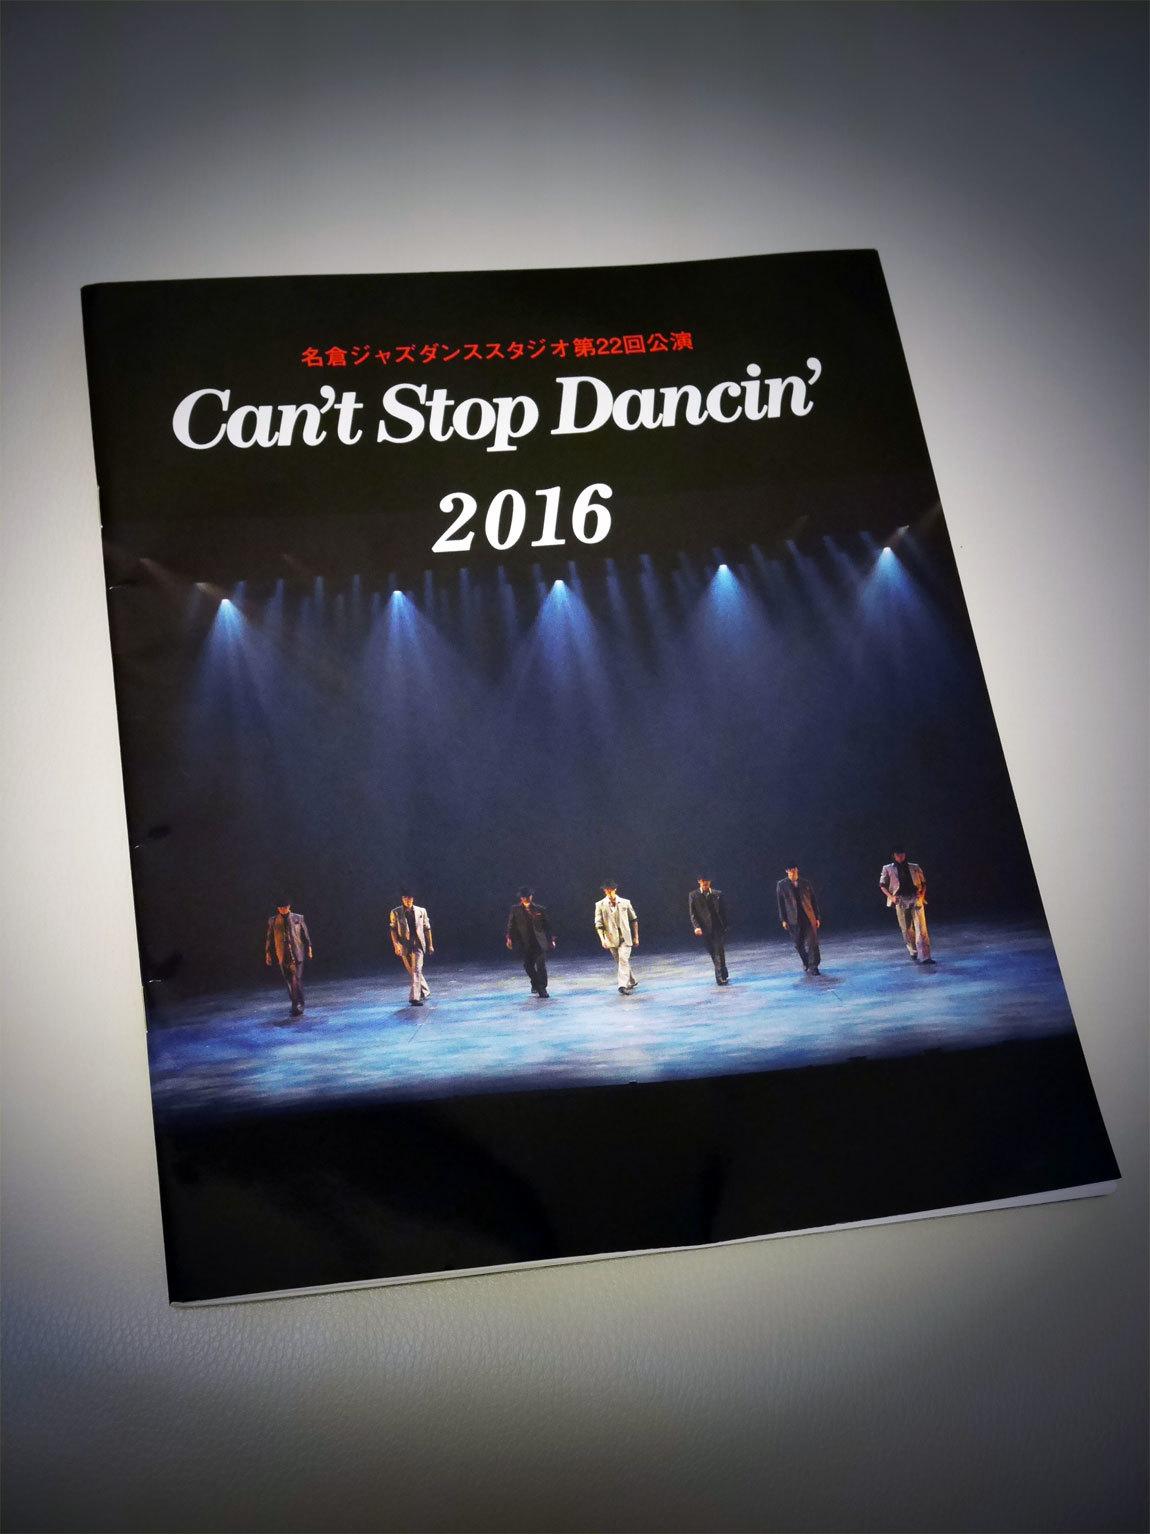 【CAN'T STOP DANCIN' 2016】、そして素敵なランチと絵本。_d0224894_04493017.jpg